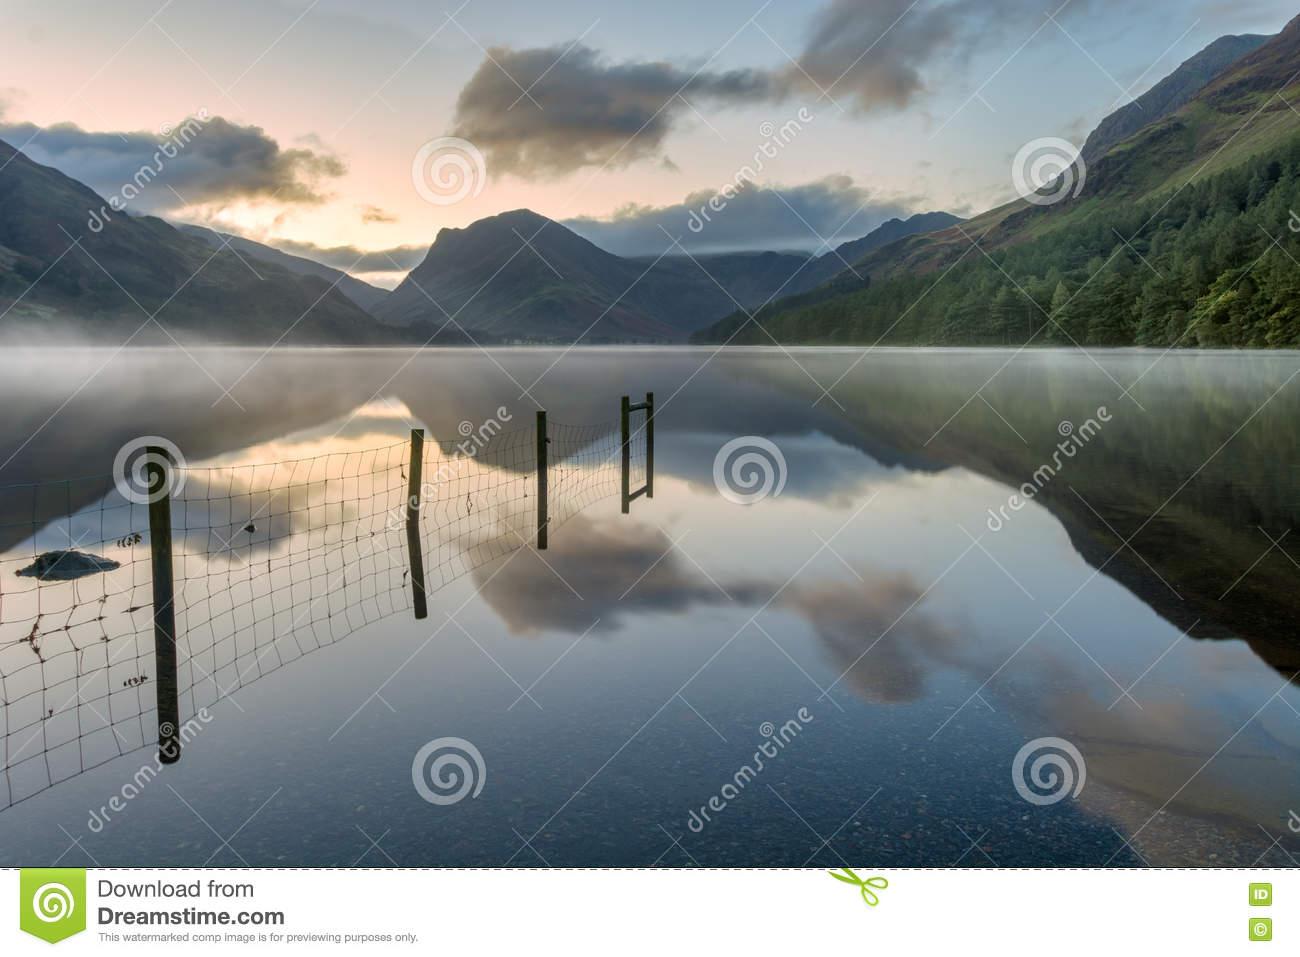 Lake District (UK) clipart #12, Download drawings